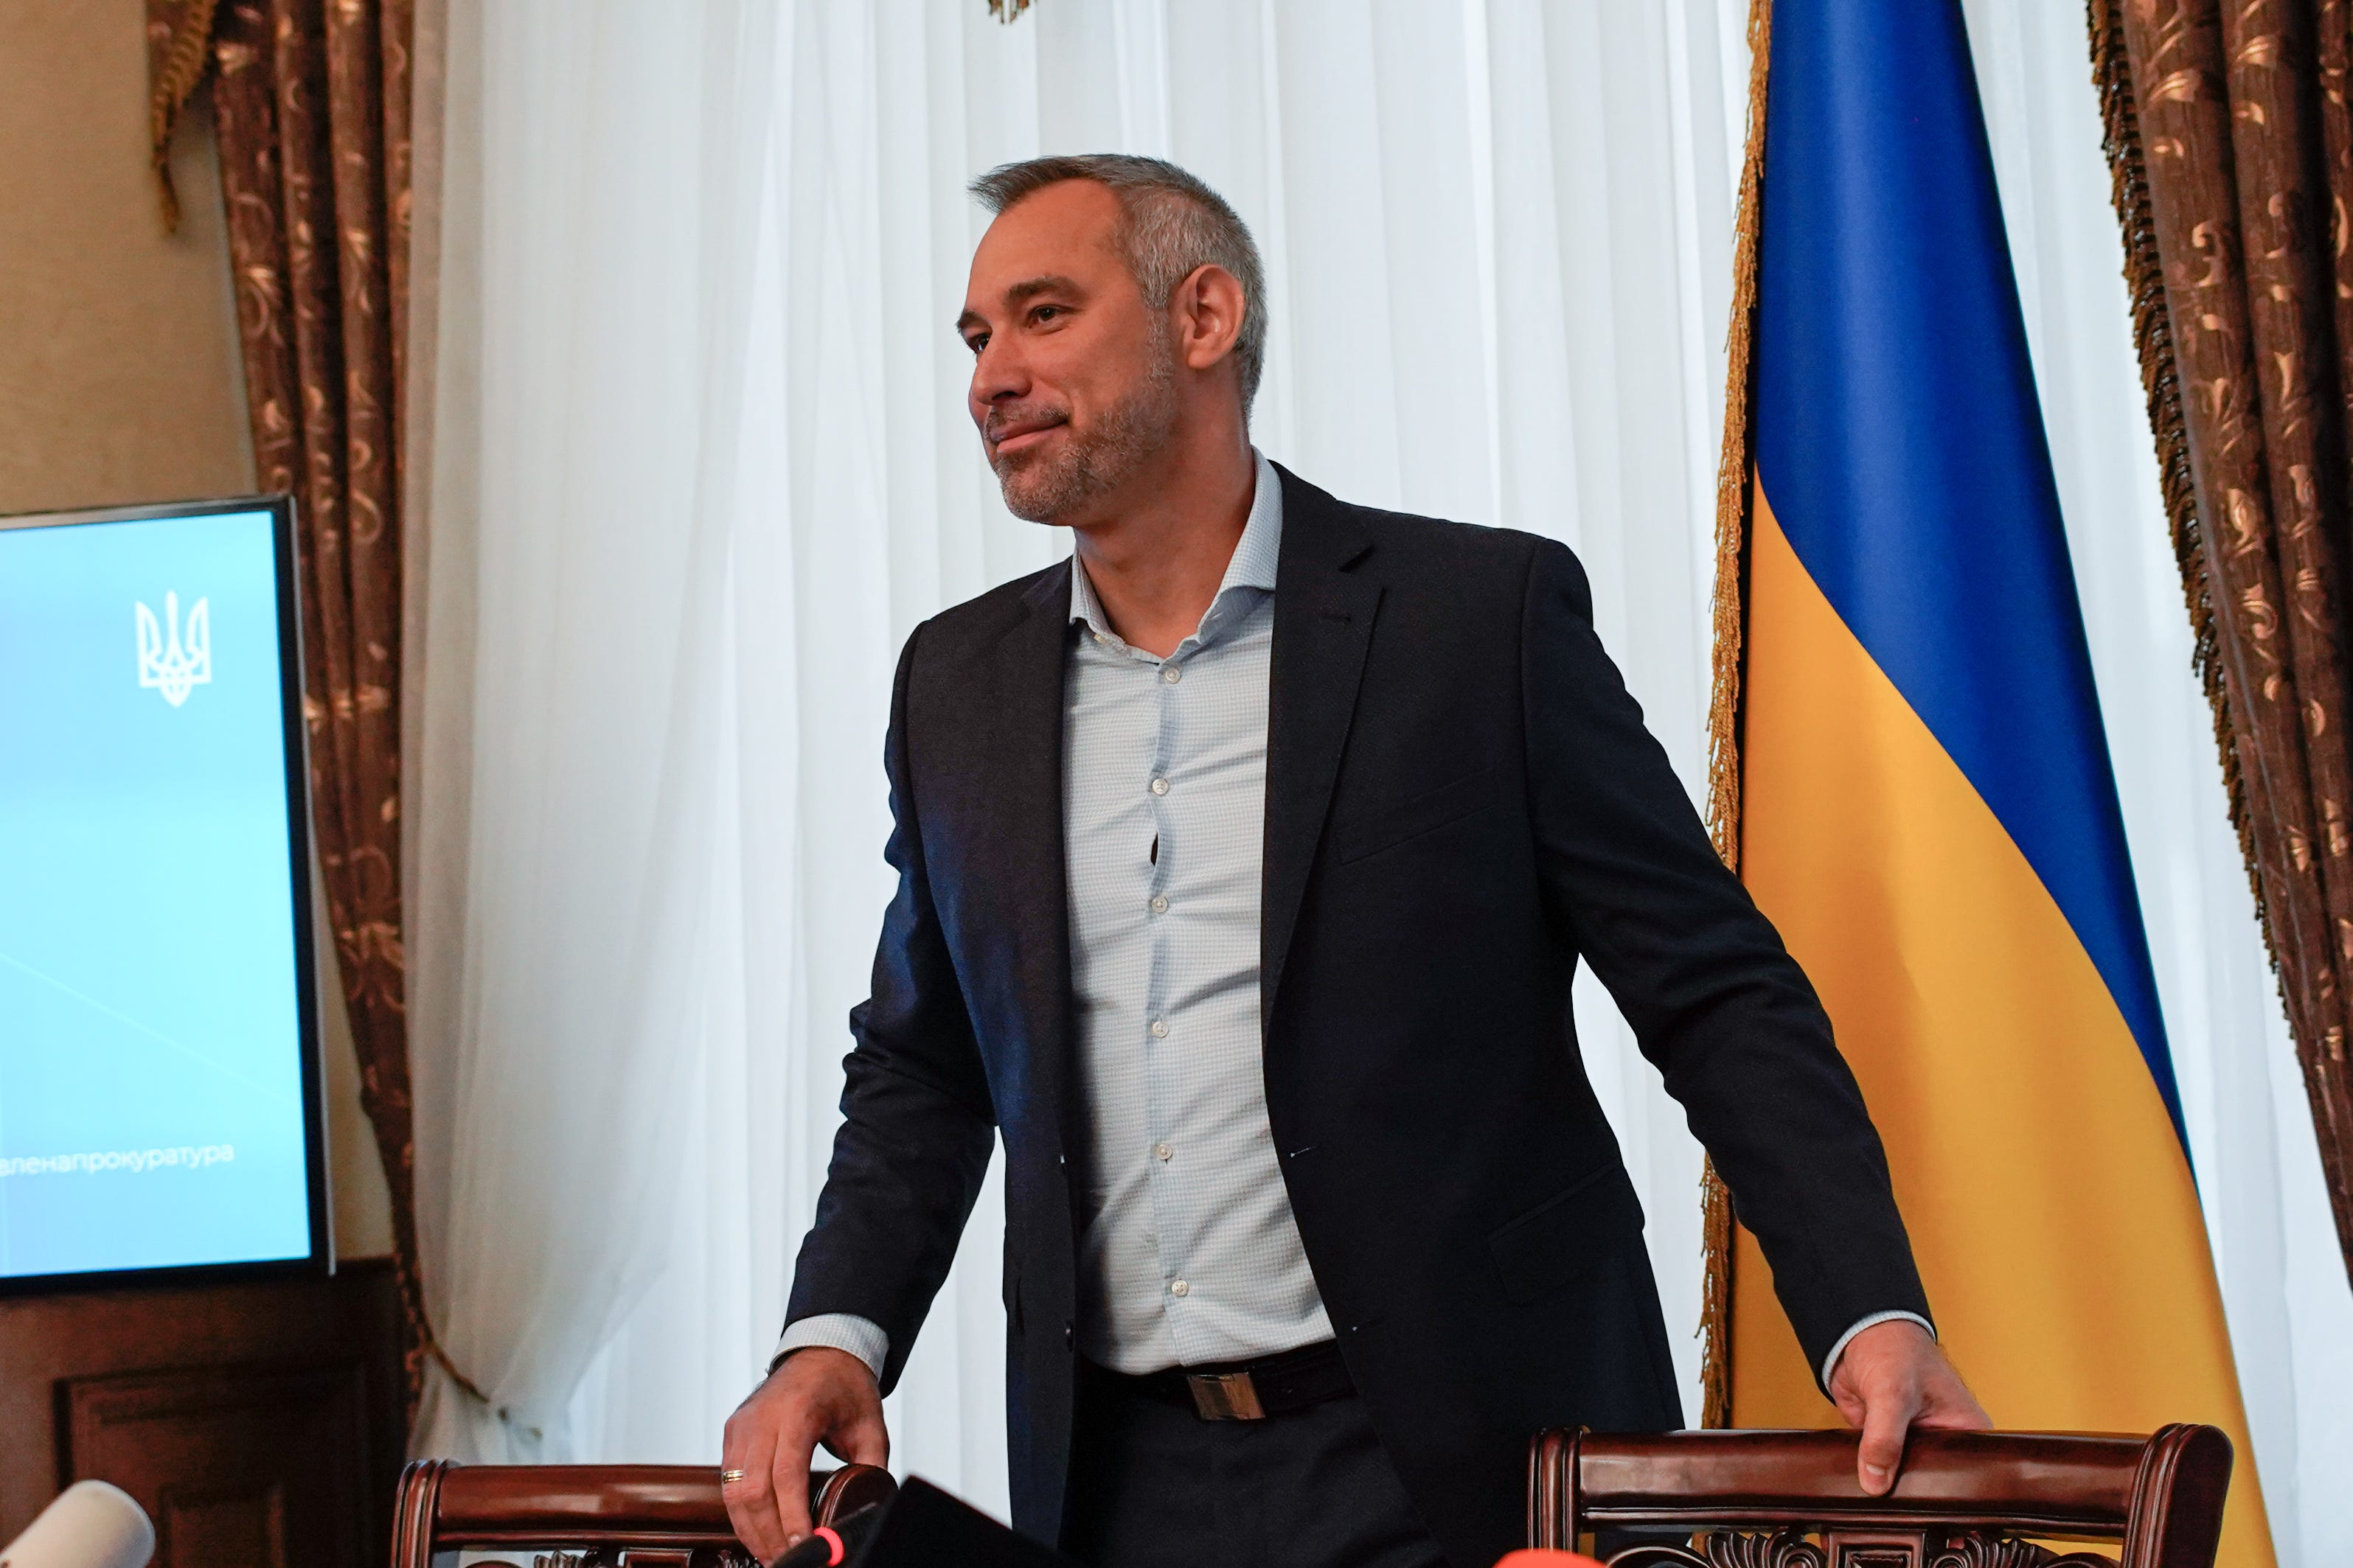 Ukraine's new general prosecutor, Ruslan Ryaboshapka, during a press conference in Kyiv on Oct. 4, 2019.